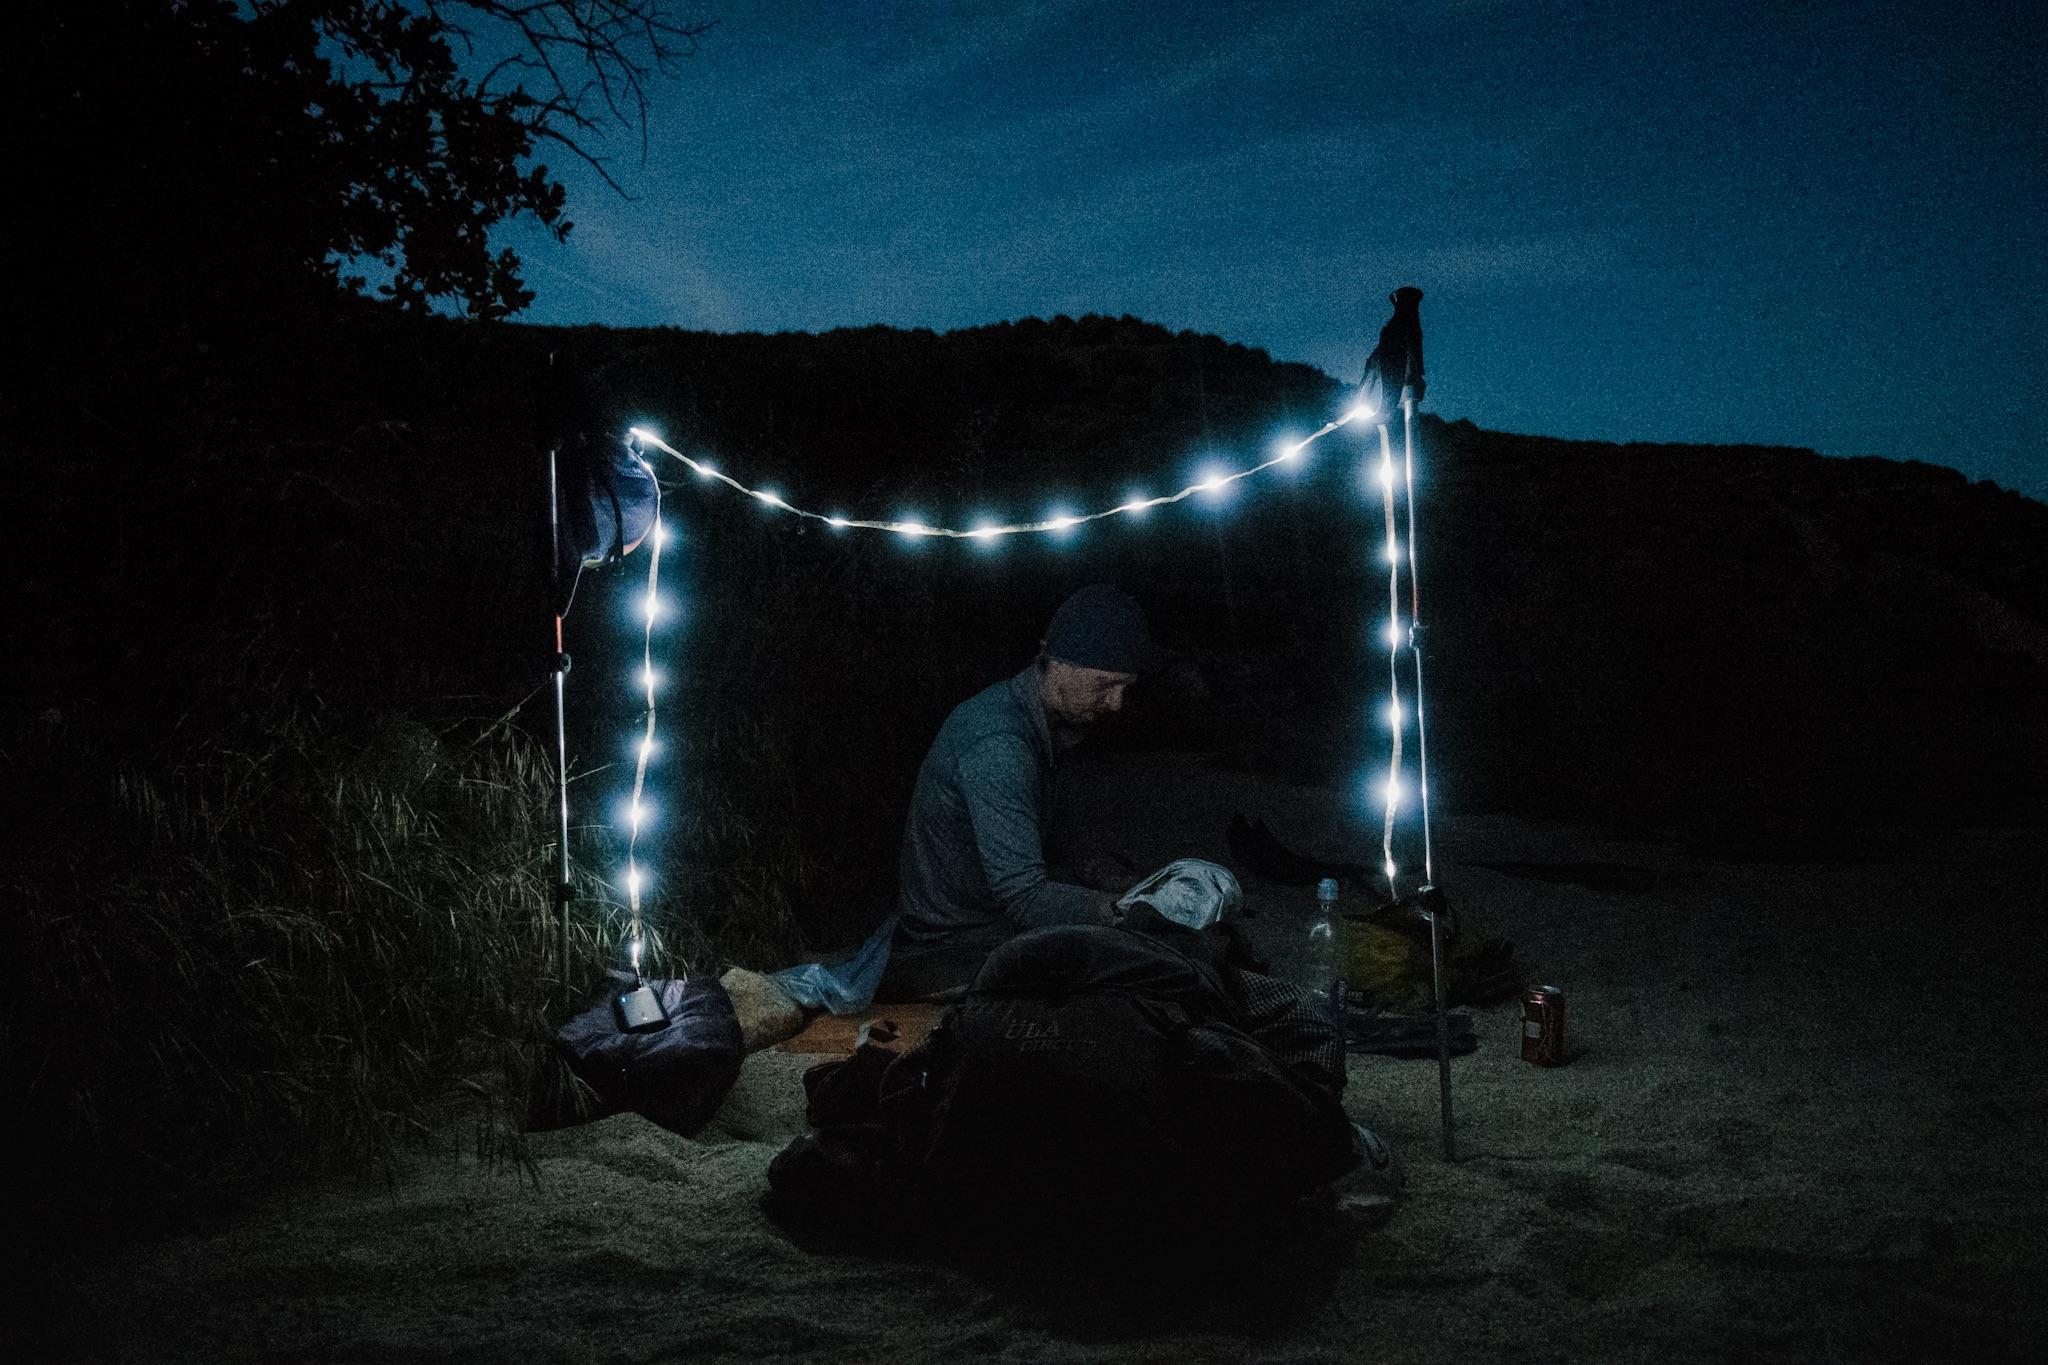 Queso's nightlight setup.